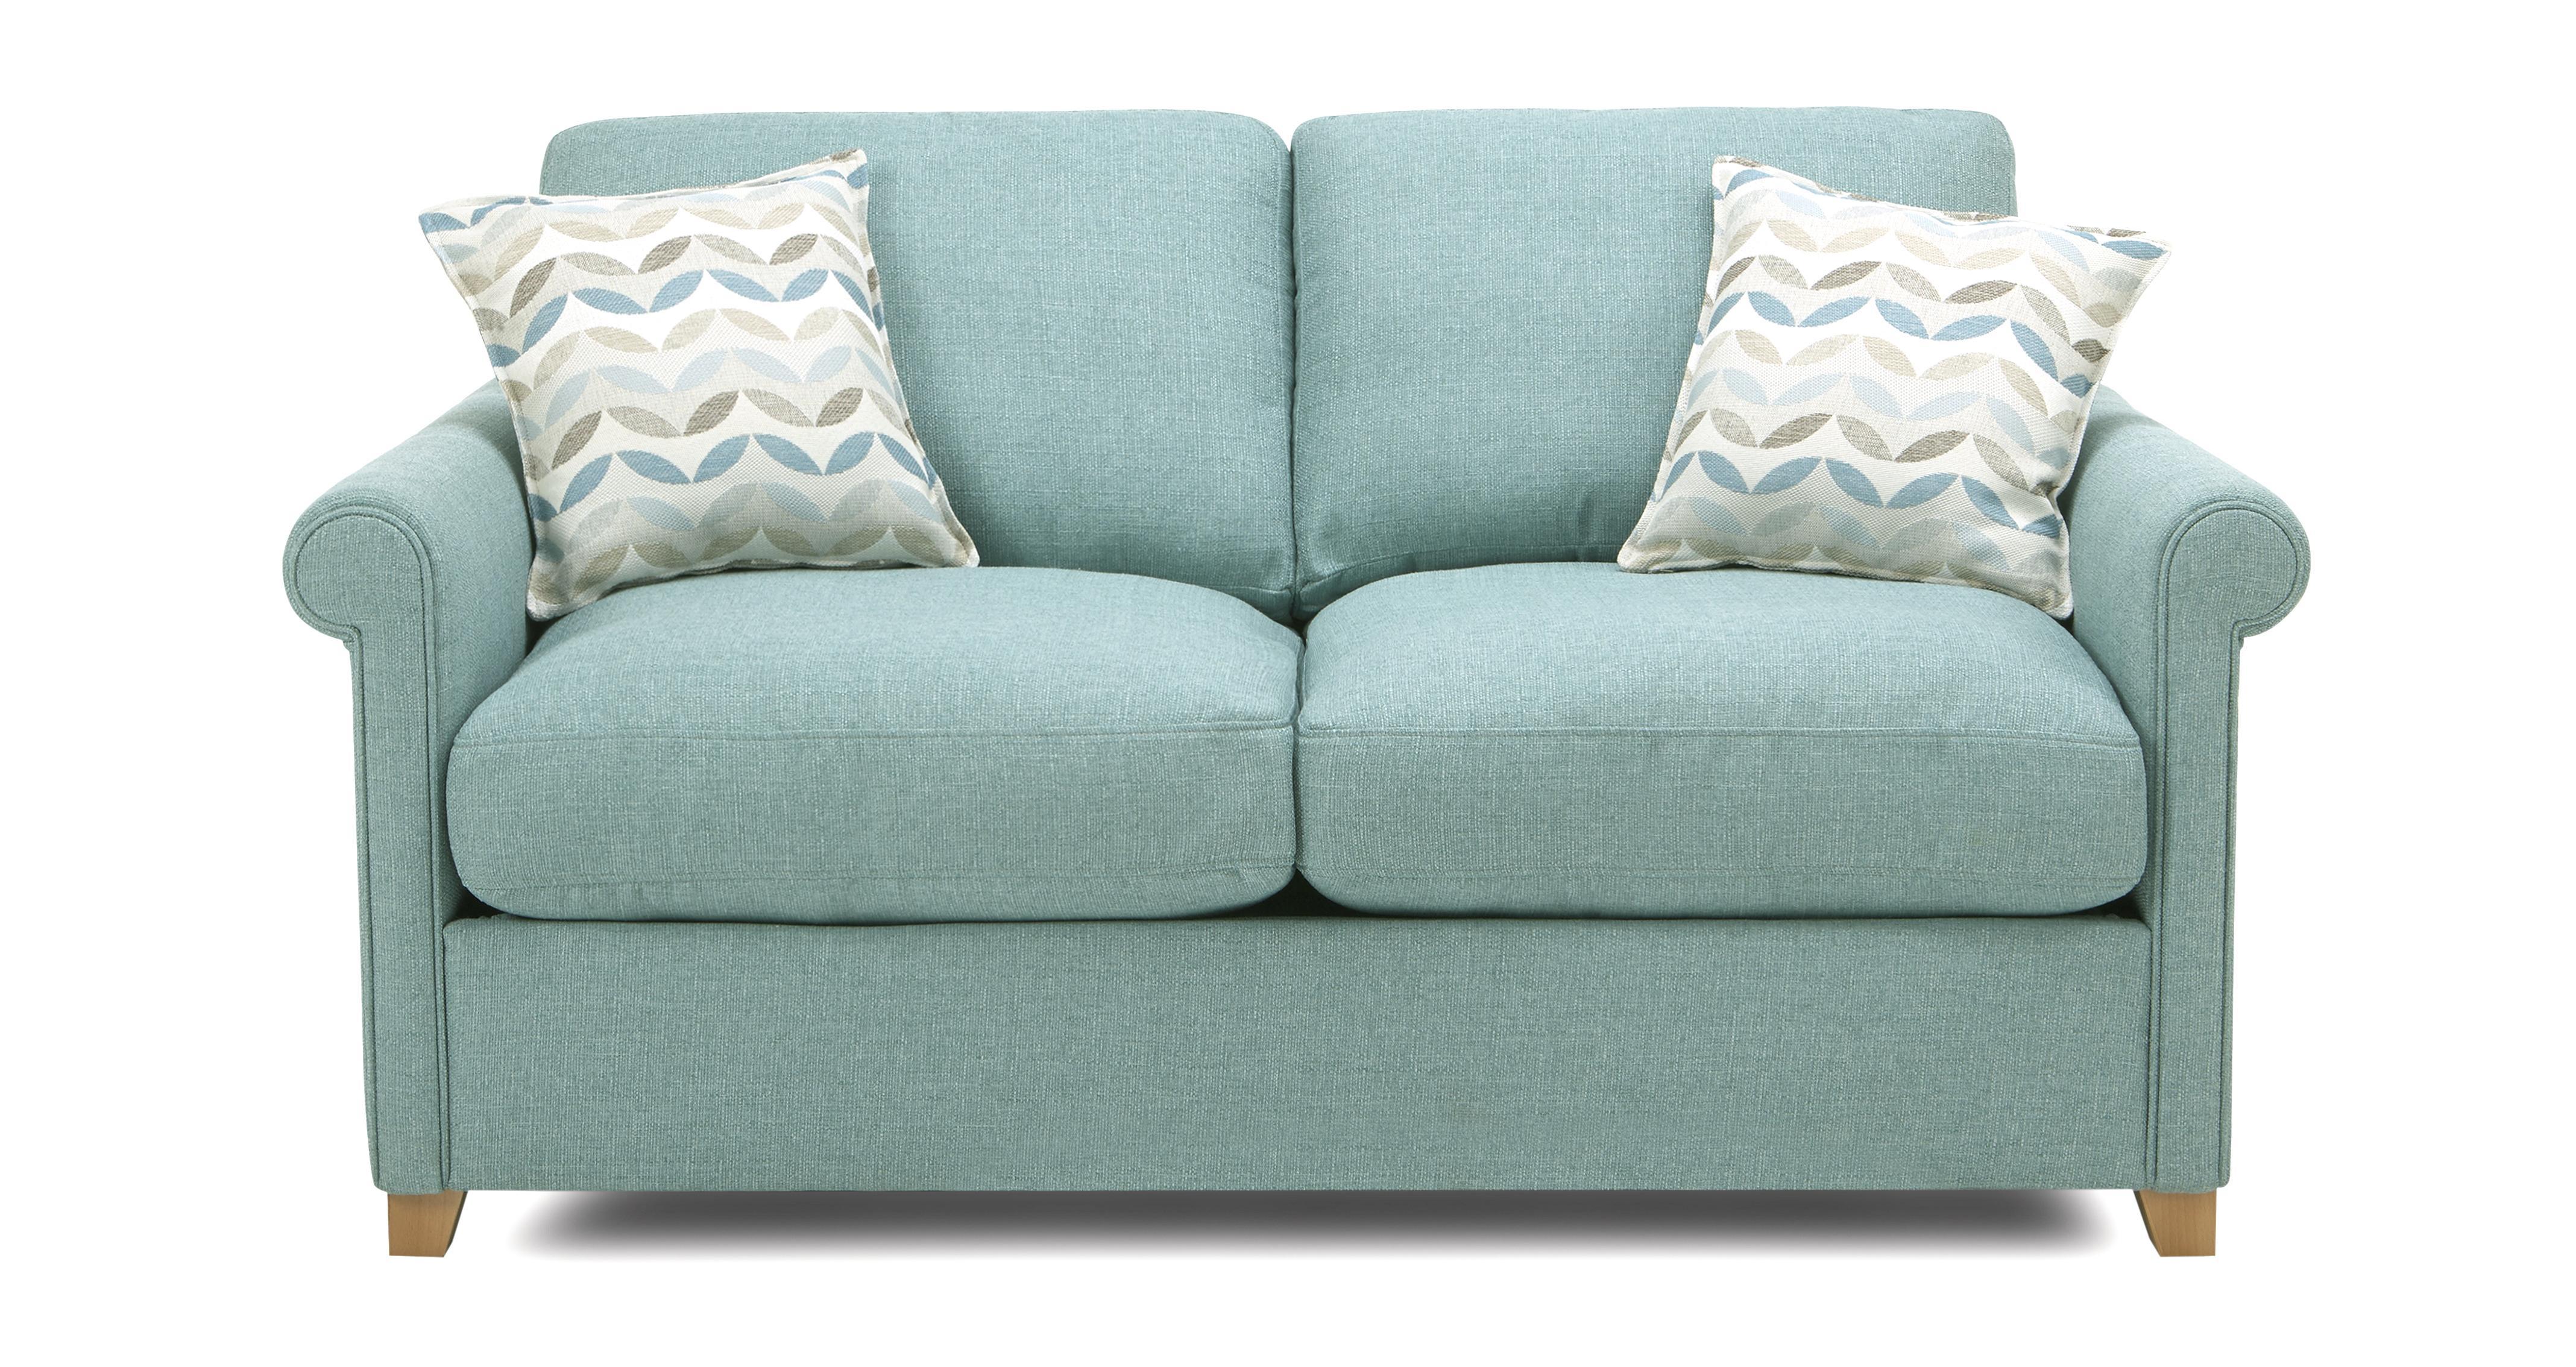 Anya 2 seater sofa bed dfs ireland for Sofa bed ireland